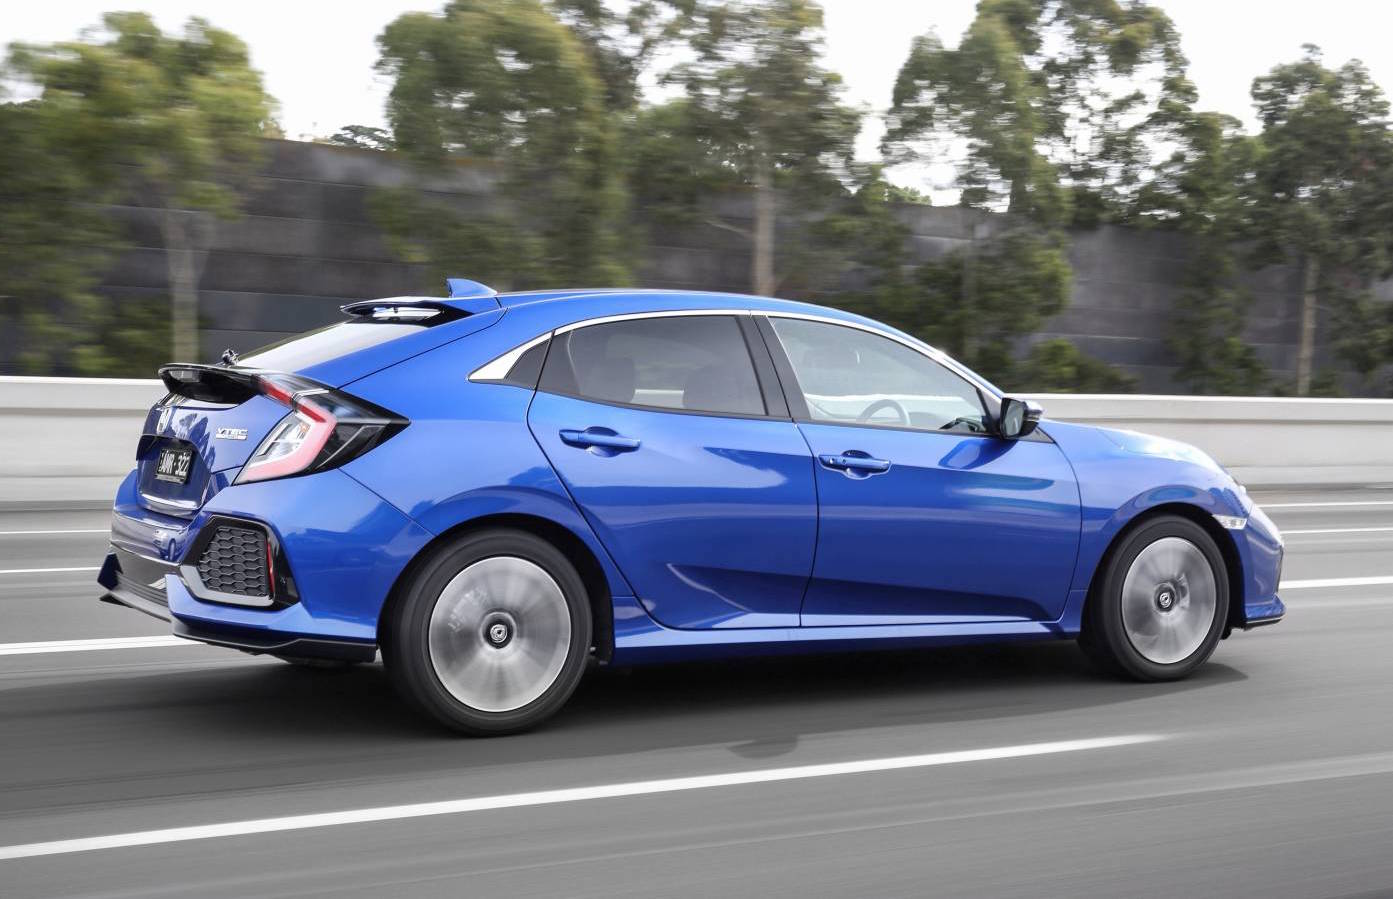 2017 Honda Civic hatch now on sale in Australia | PerformanceDrive